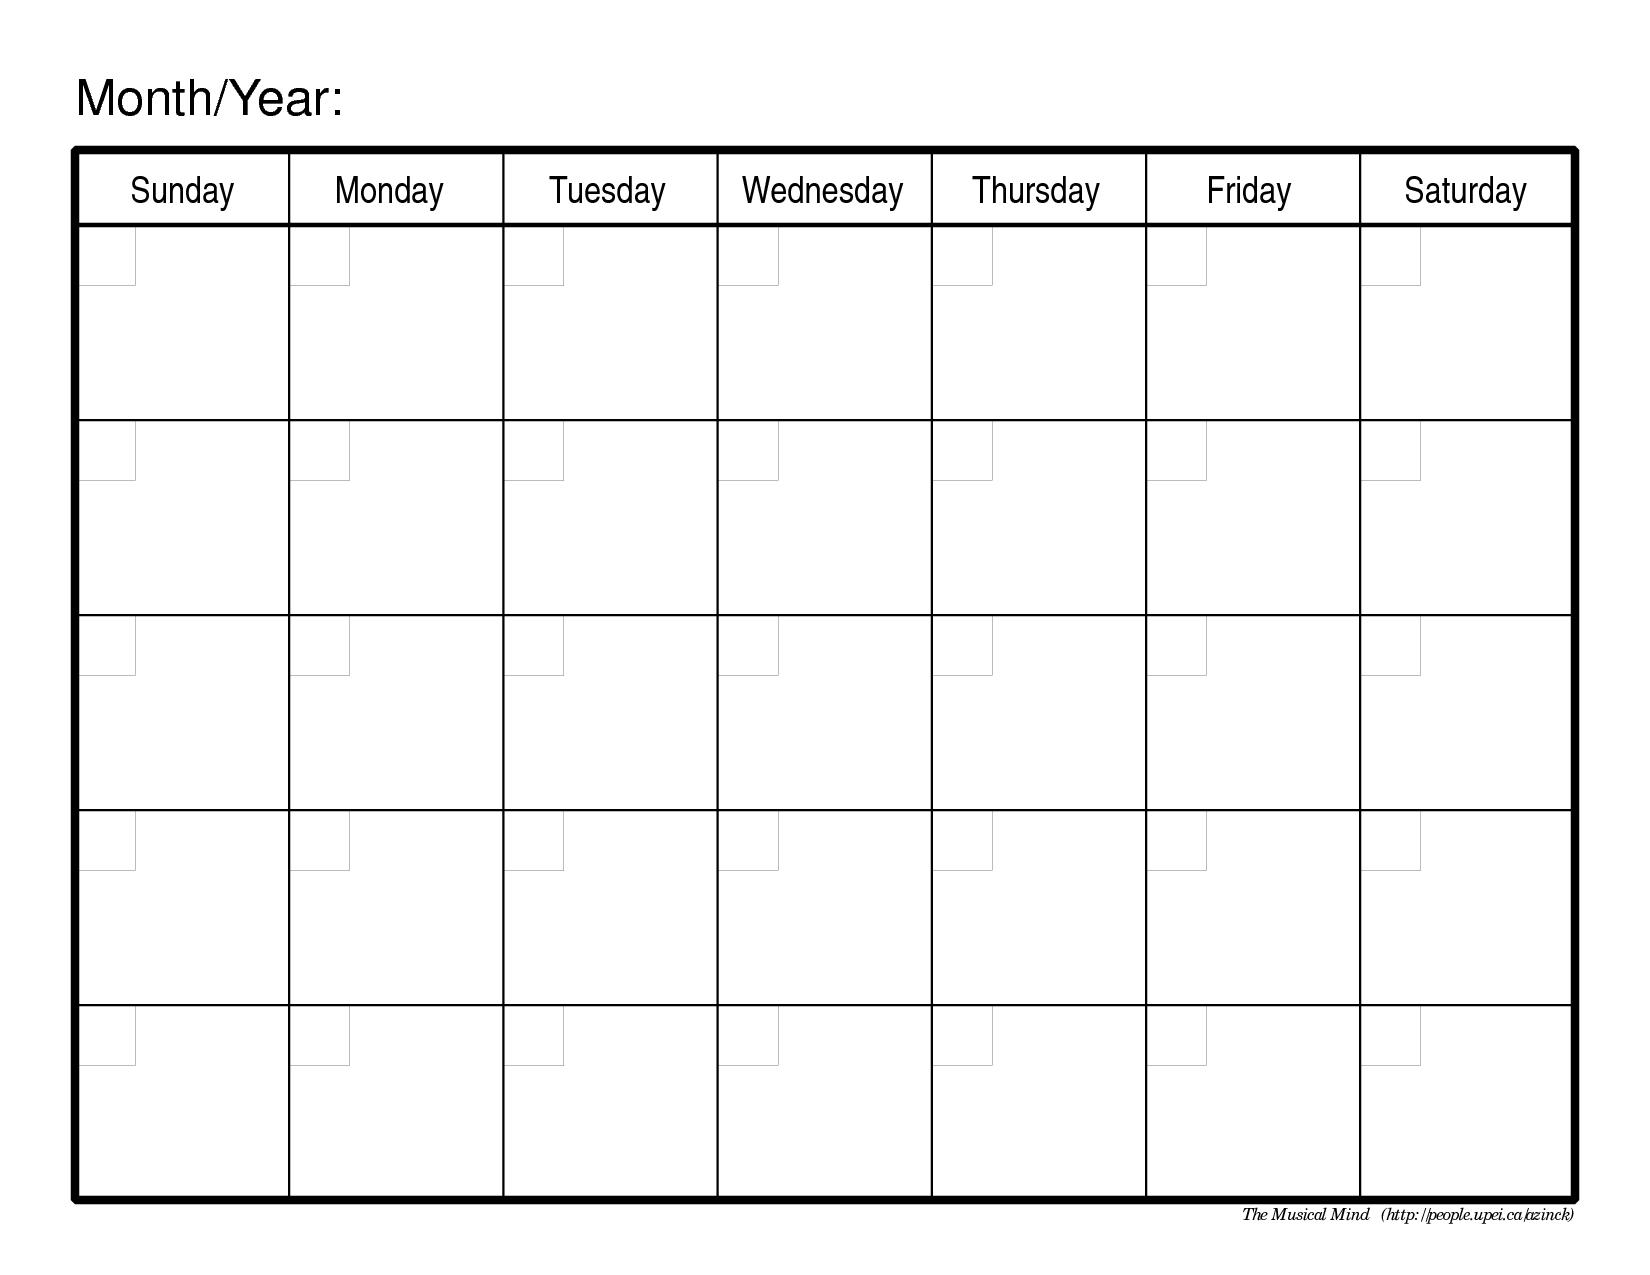 Calendar Templates Printable Free Fieldstation.co | Self Discovery inside Free Printable Blank Calendar Templates